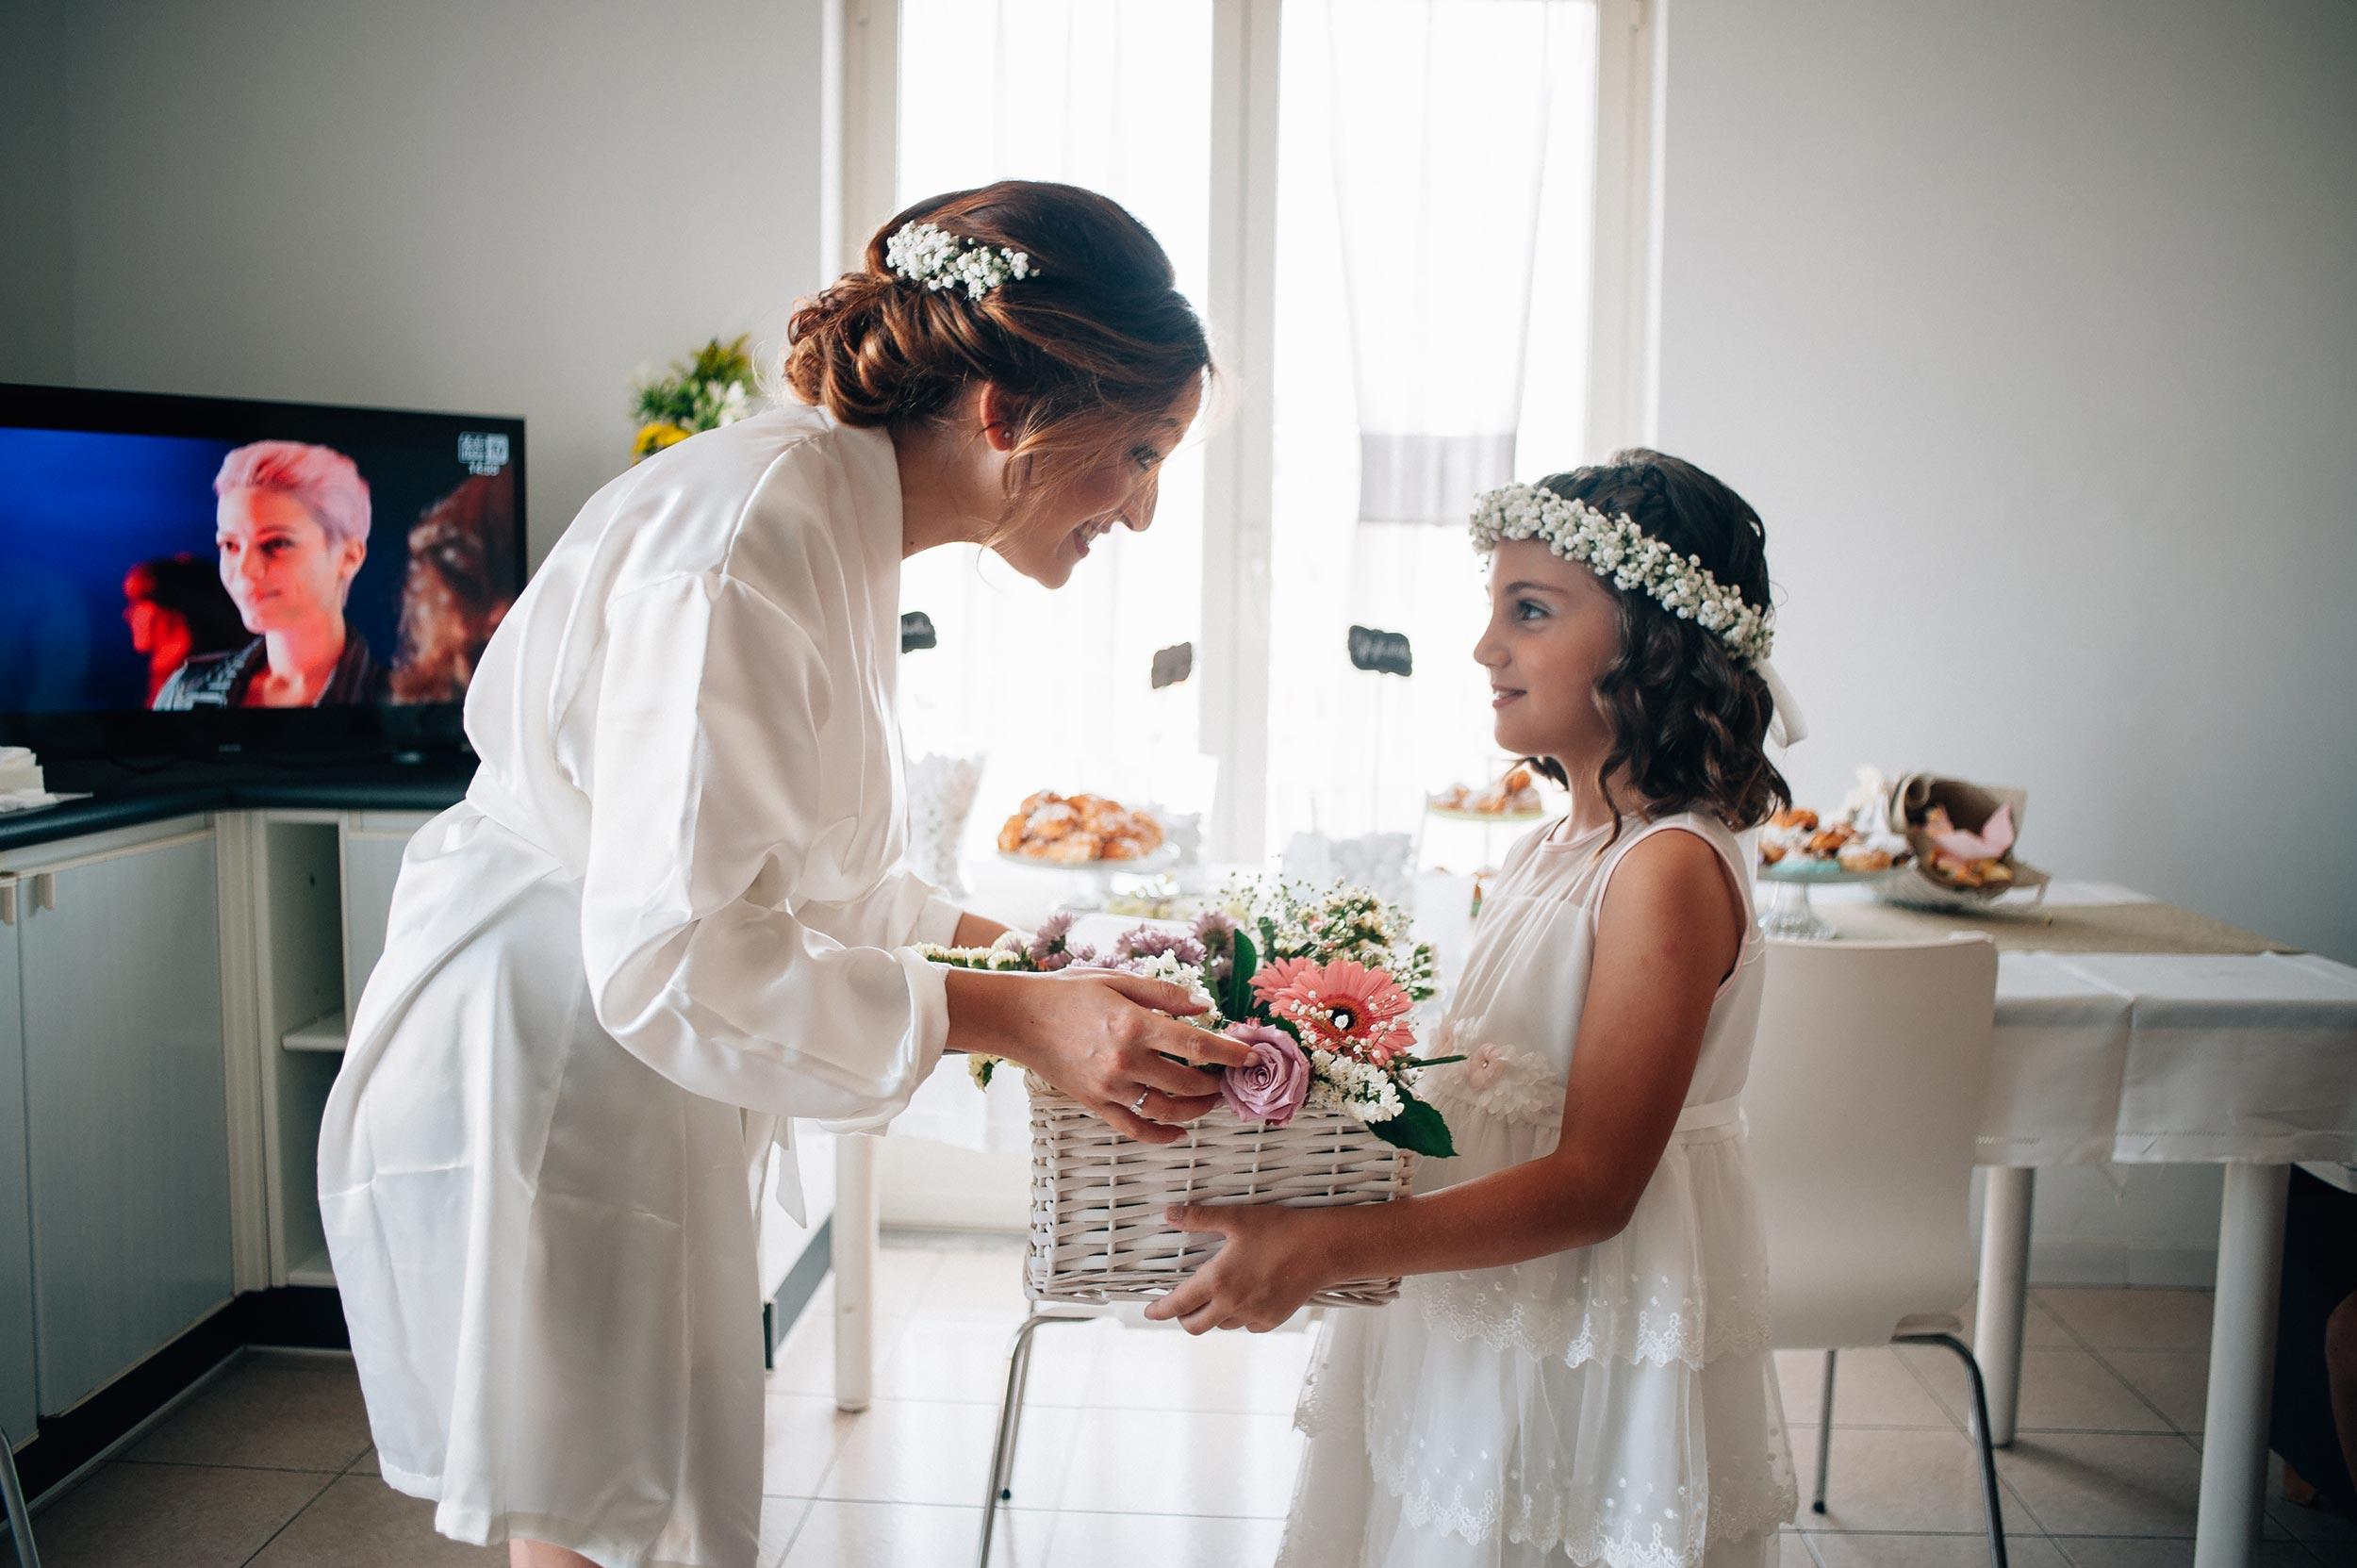 2016-Claudio-Teresa-Naples-Wedding-Photographer-Italy-Alessandro-Avenali-19.jpg